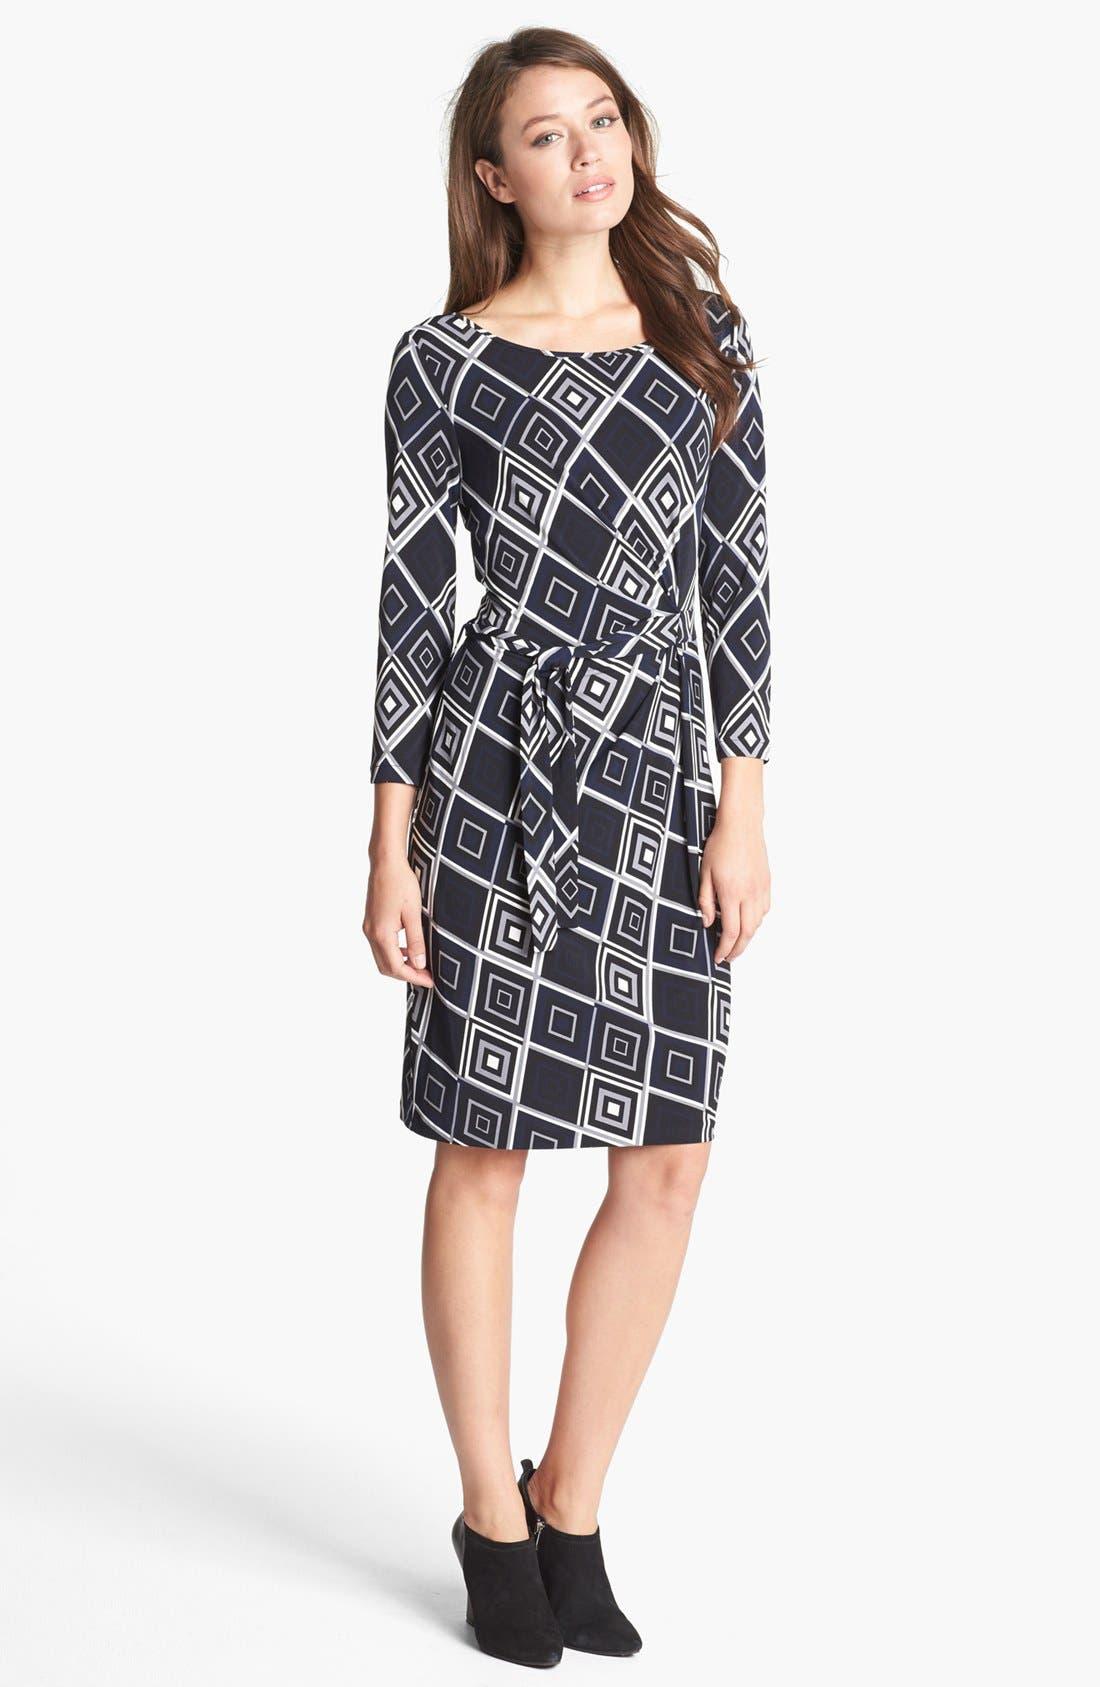 Alternate Image 1 Selected - Anne Klein Print Faux Wrap Dress